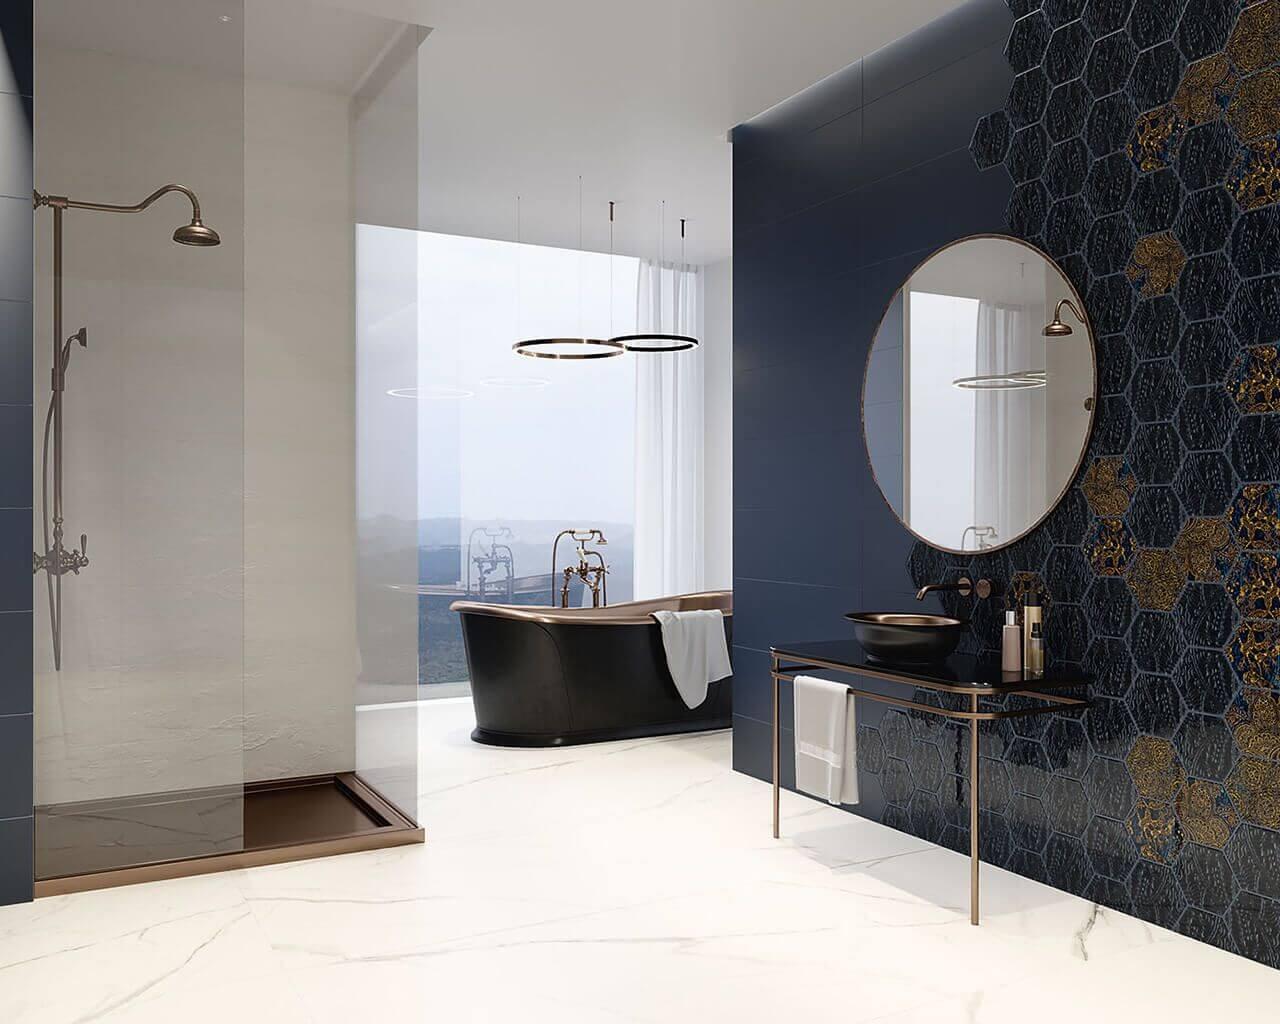 Urban-Colours-Bianco-Struktura-A-298x898_blue-298x898_blue-inserto-szklane-heksagon-198x171_blue-inserto-szklane-heksagon-A,B,C-_-Calacatta-mat-898x1798